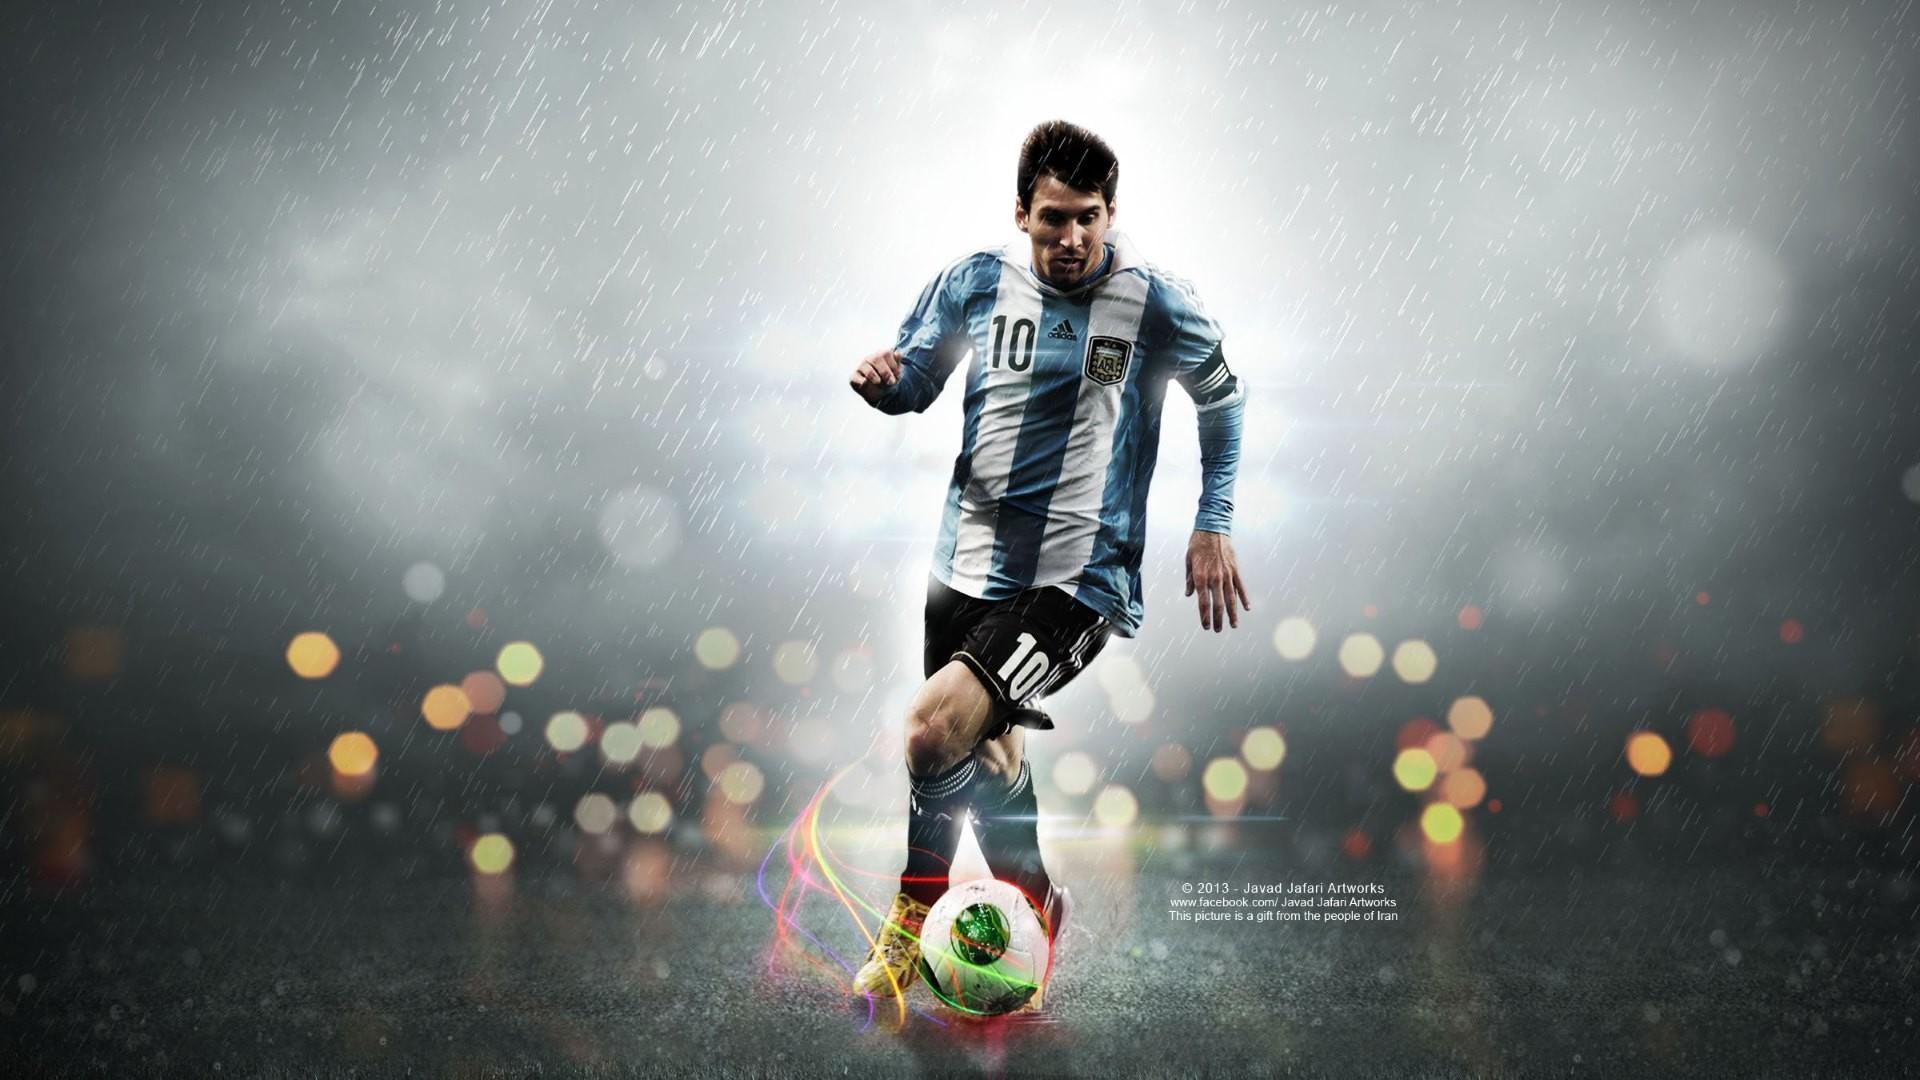 Lionel Messi Full Size Hd: Lionel Messi Wallpaper HD ·① WallpaperTag